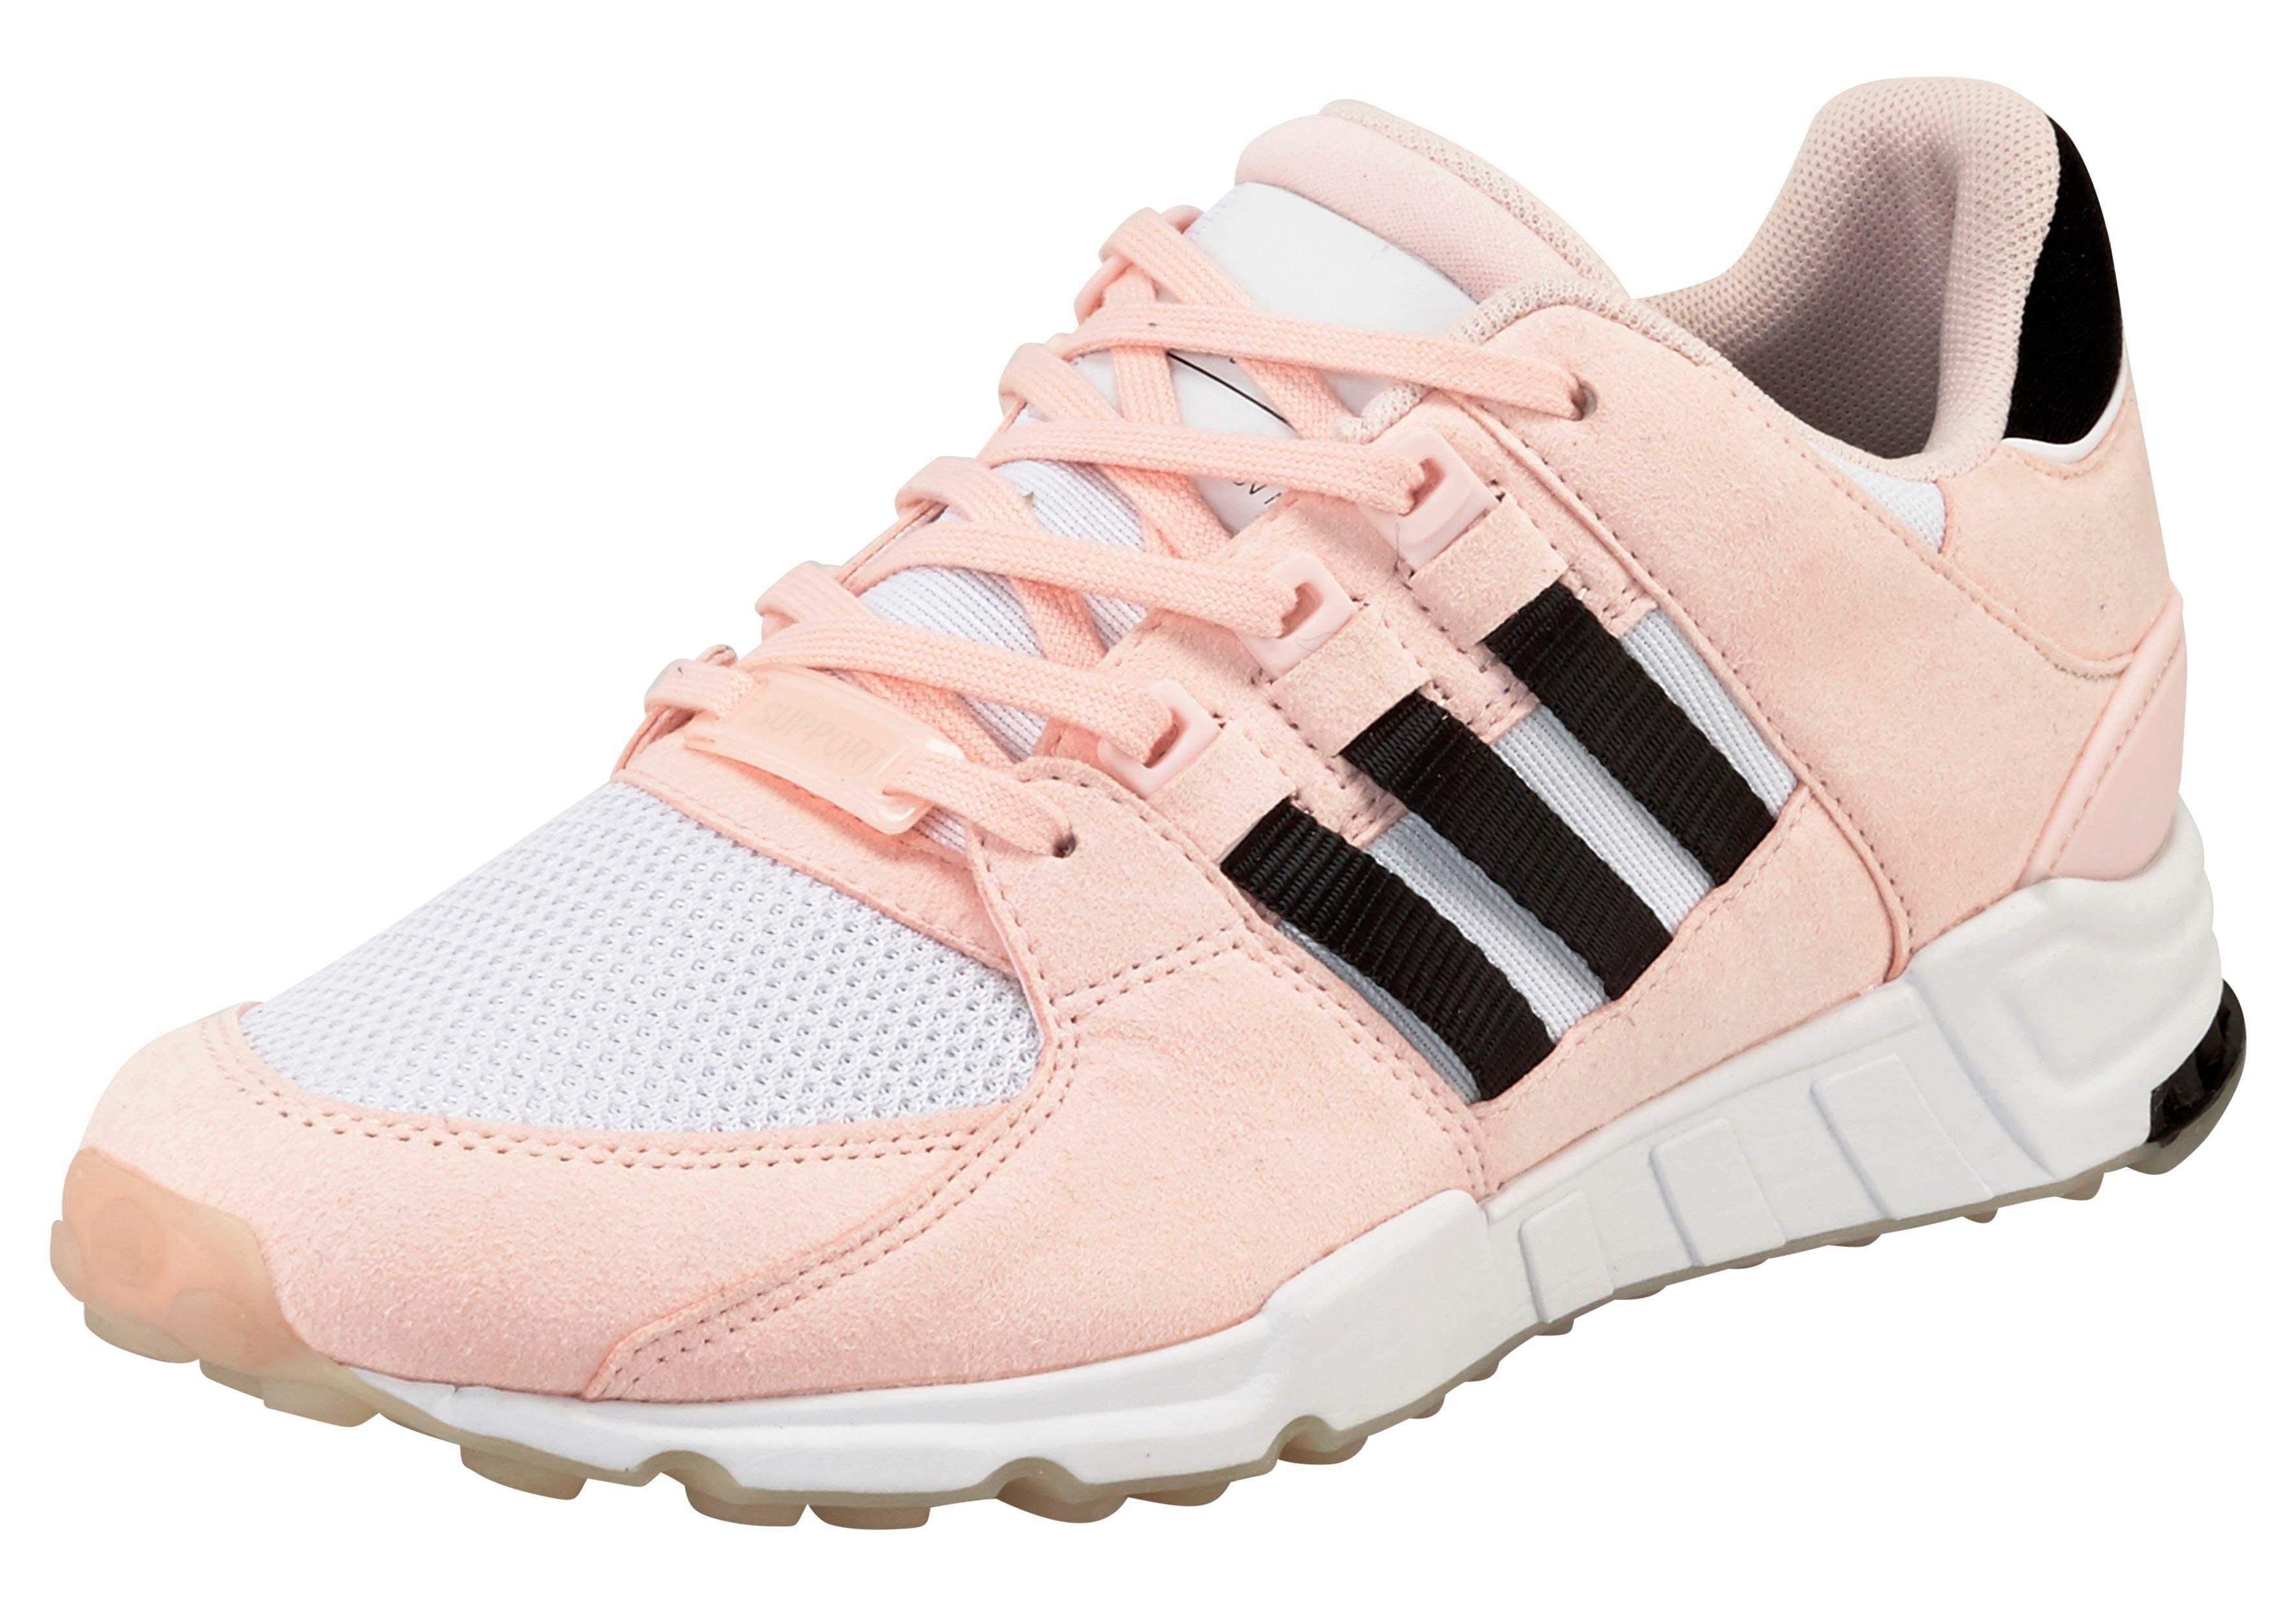 adidas Originals EQT Support RF W Sneaker kaufen  pastell-rosa